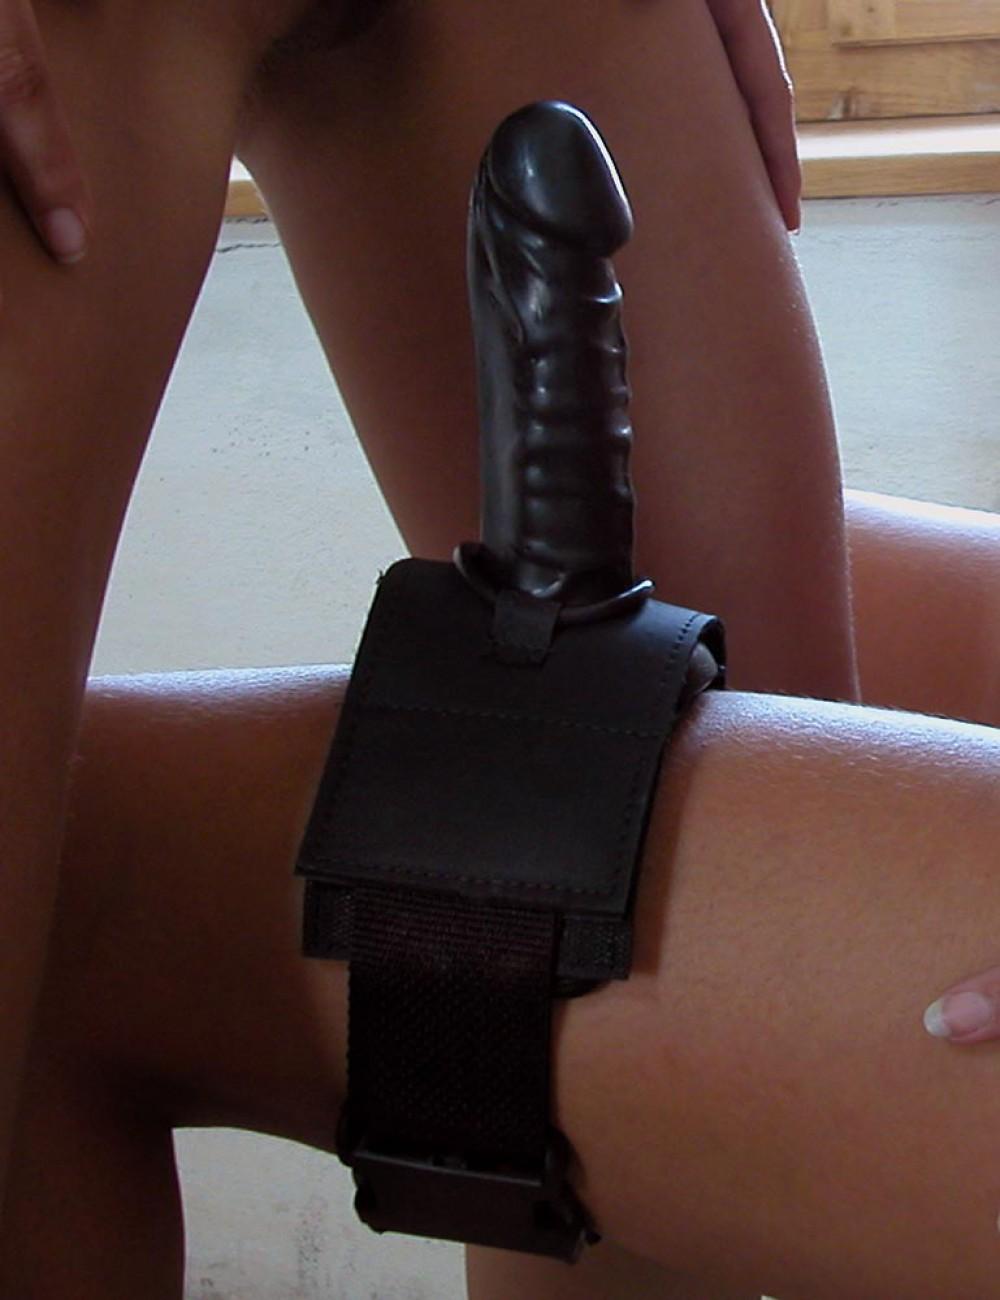 Malibu Thigh Harness, Neopren